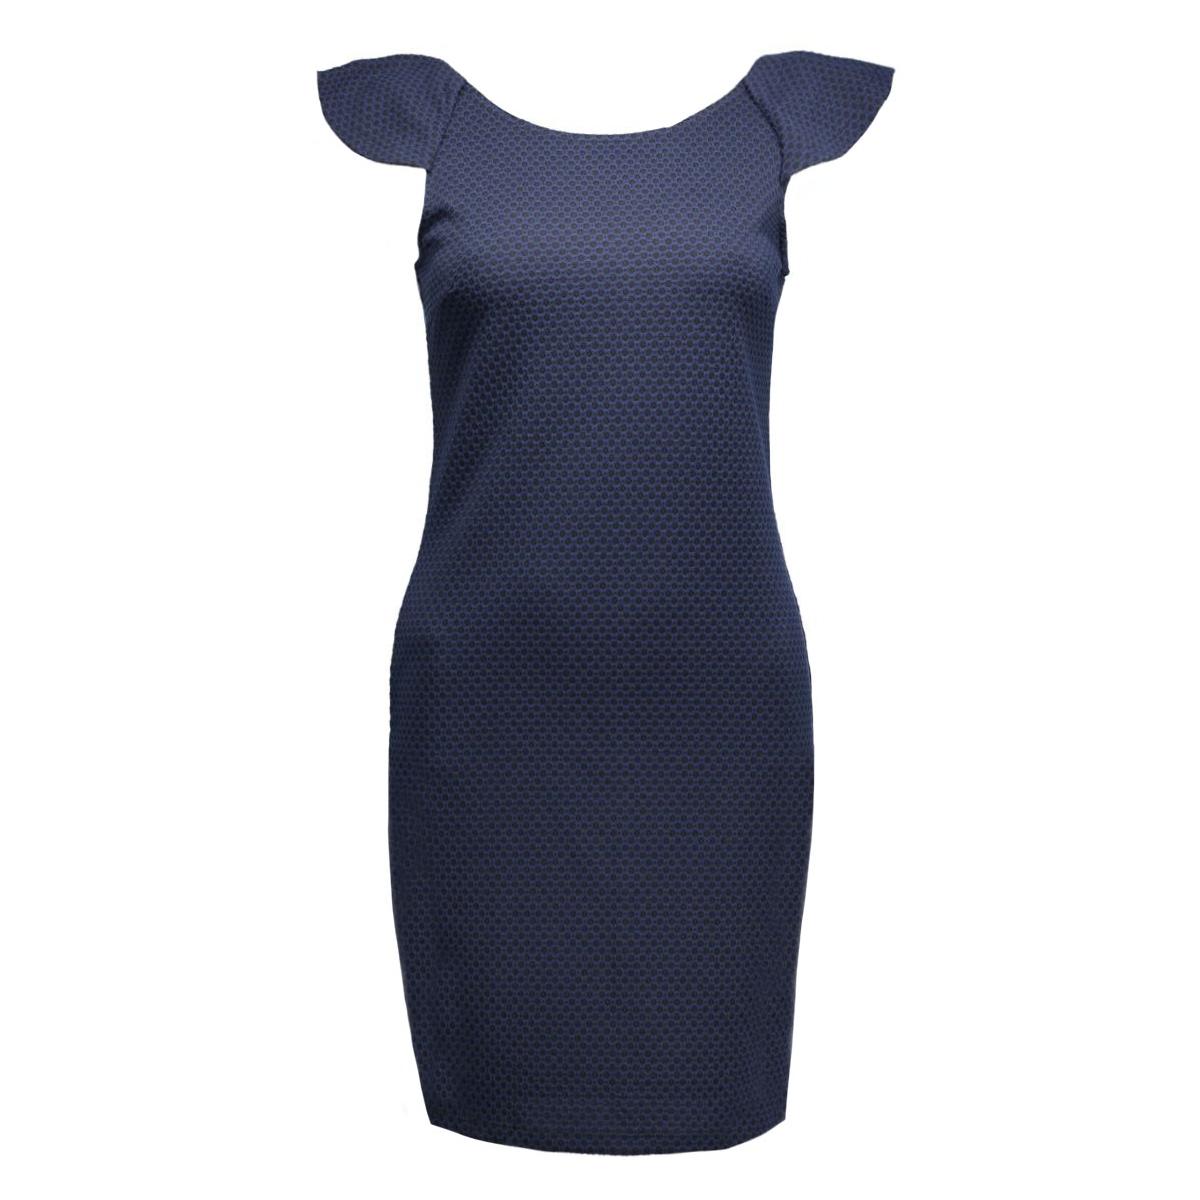 viclemment dress 14036352 vila jurk total eclipse